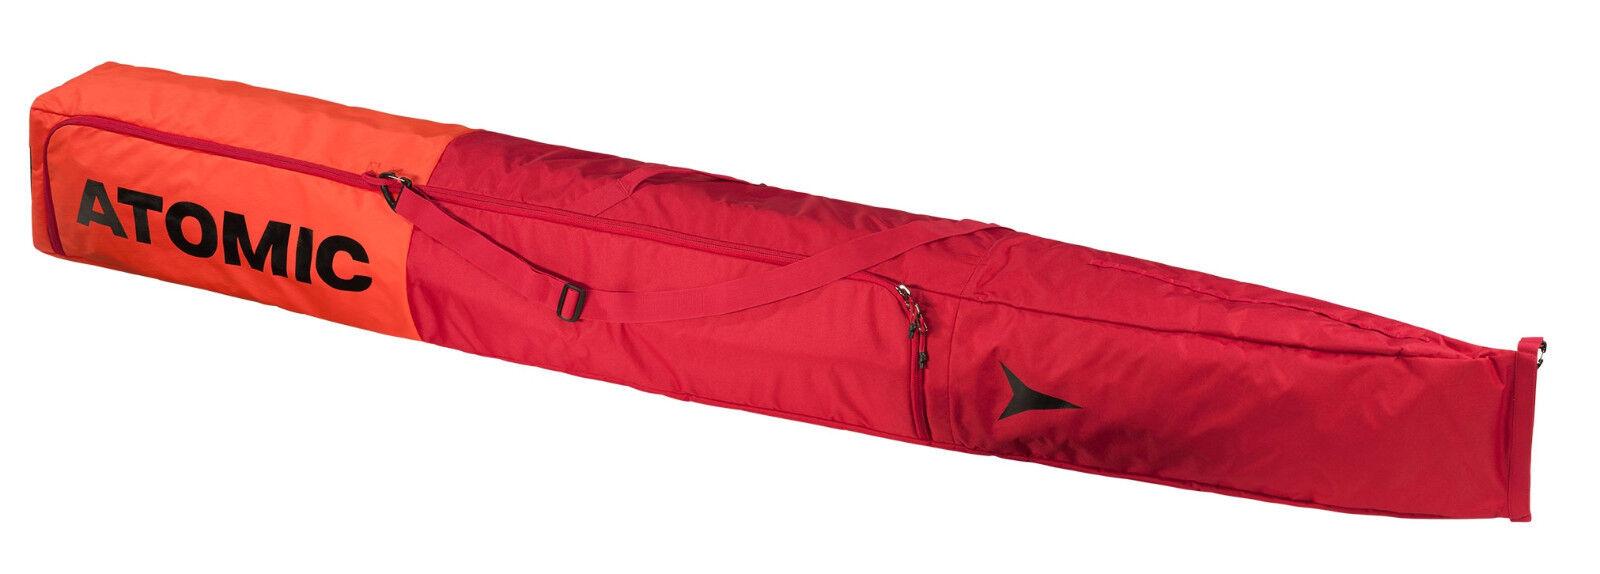 ATOMIC DOUBLE SKI BAG PADDED für 2 Paar Skitasche Skisack Collection 2019 - NEU